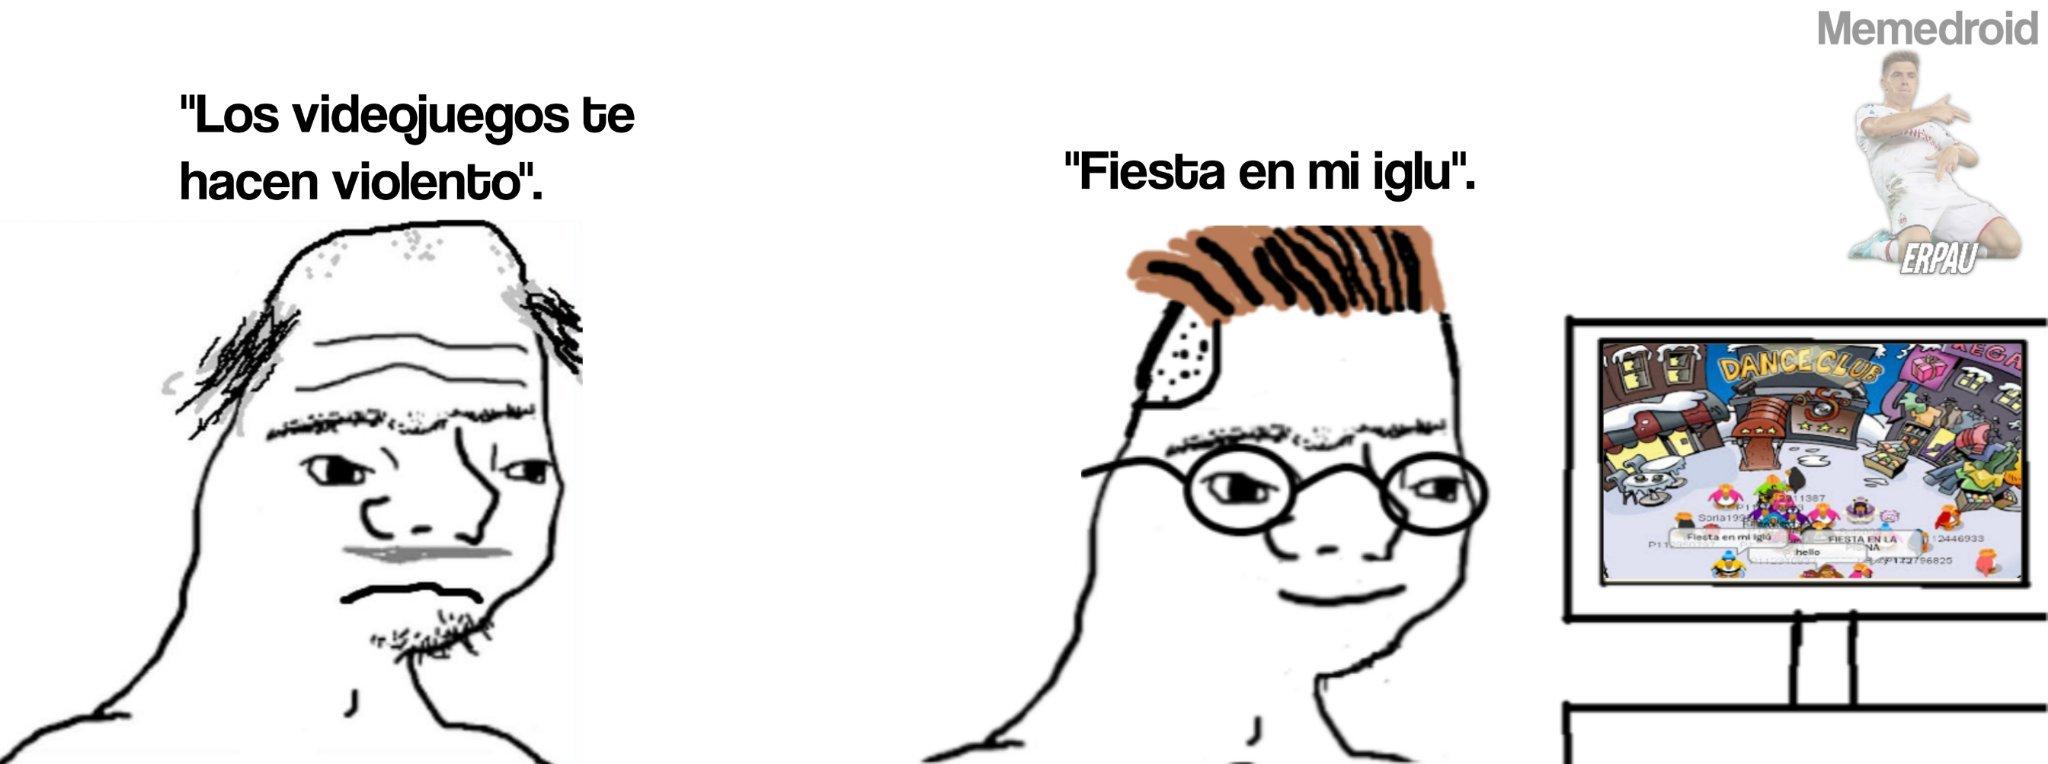 Top Memes De Autor En Espanol Memedroid